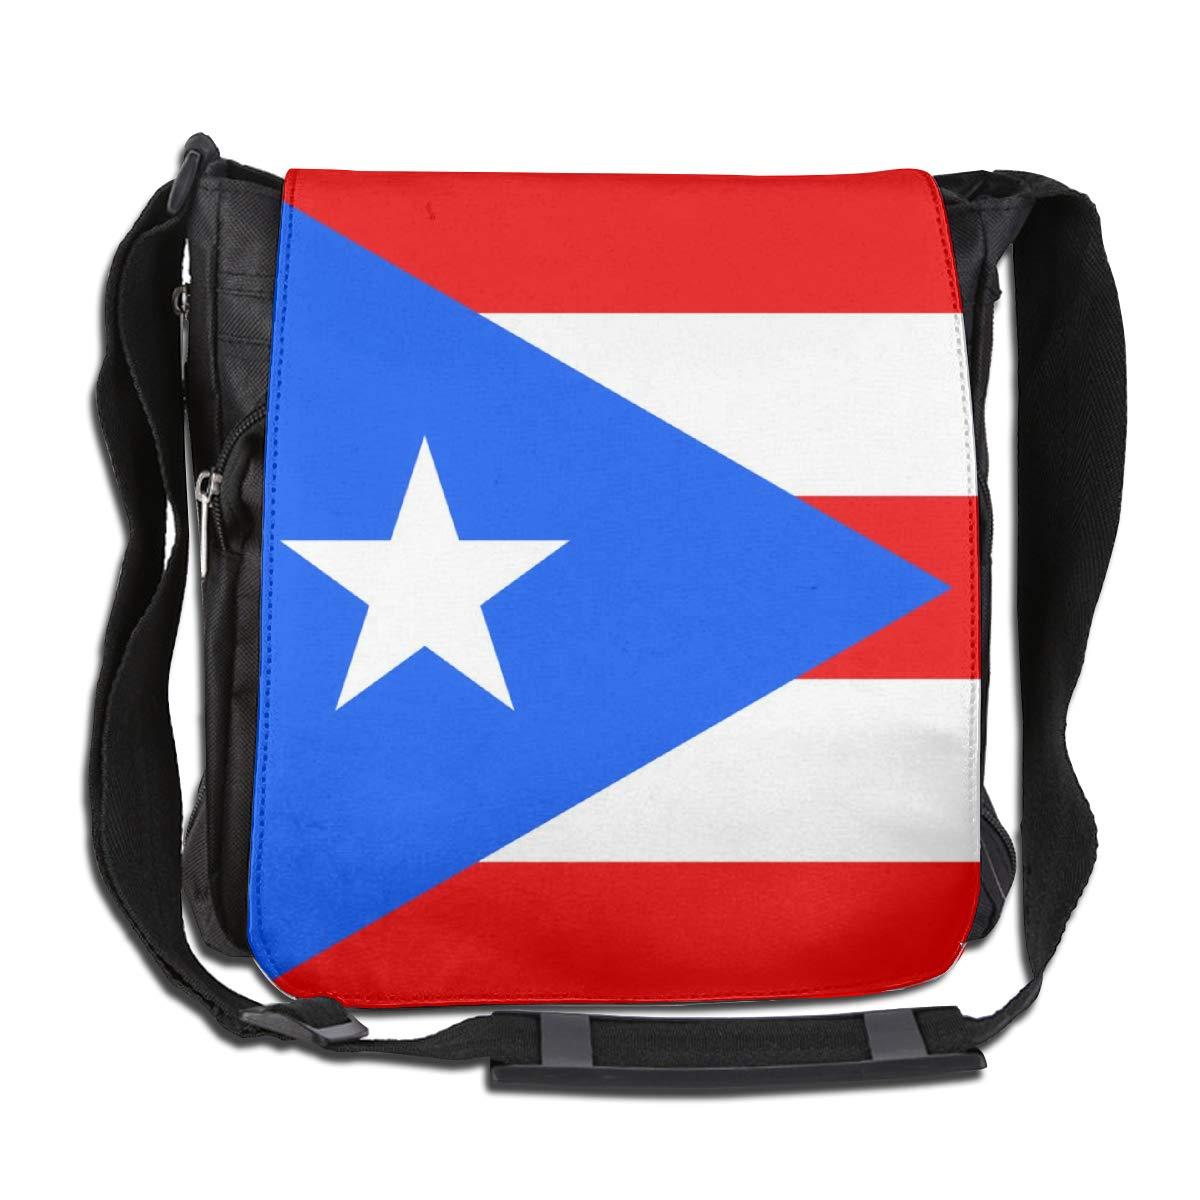 Puerto Rico Flag Crossbody Shoulder Bag Durable Casual Daily Messenger Bag Satchel School Bag For Women And Men